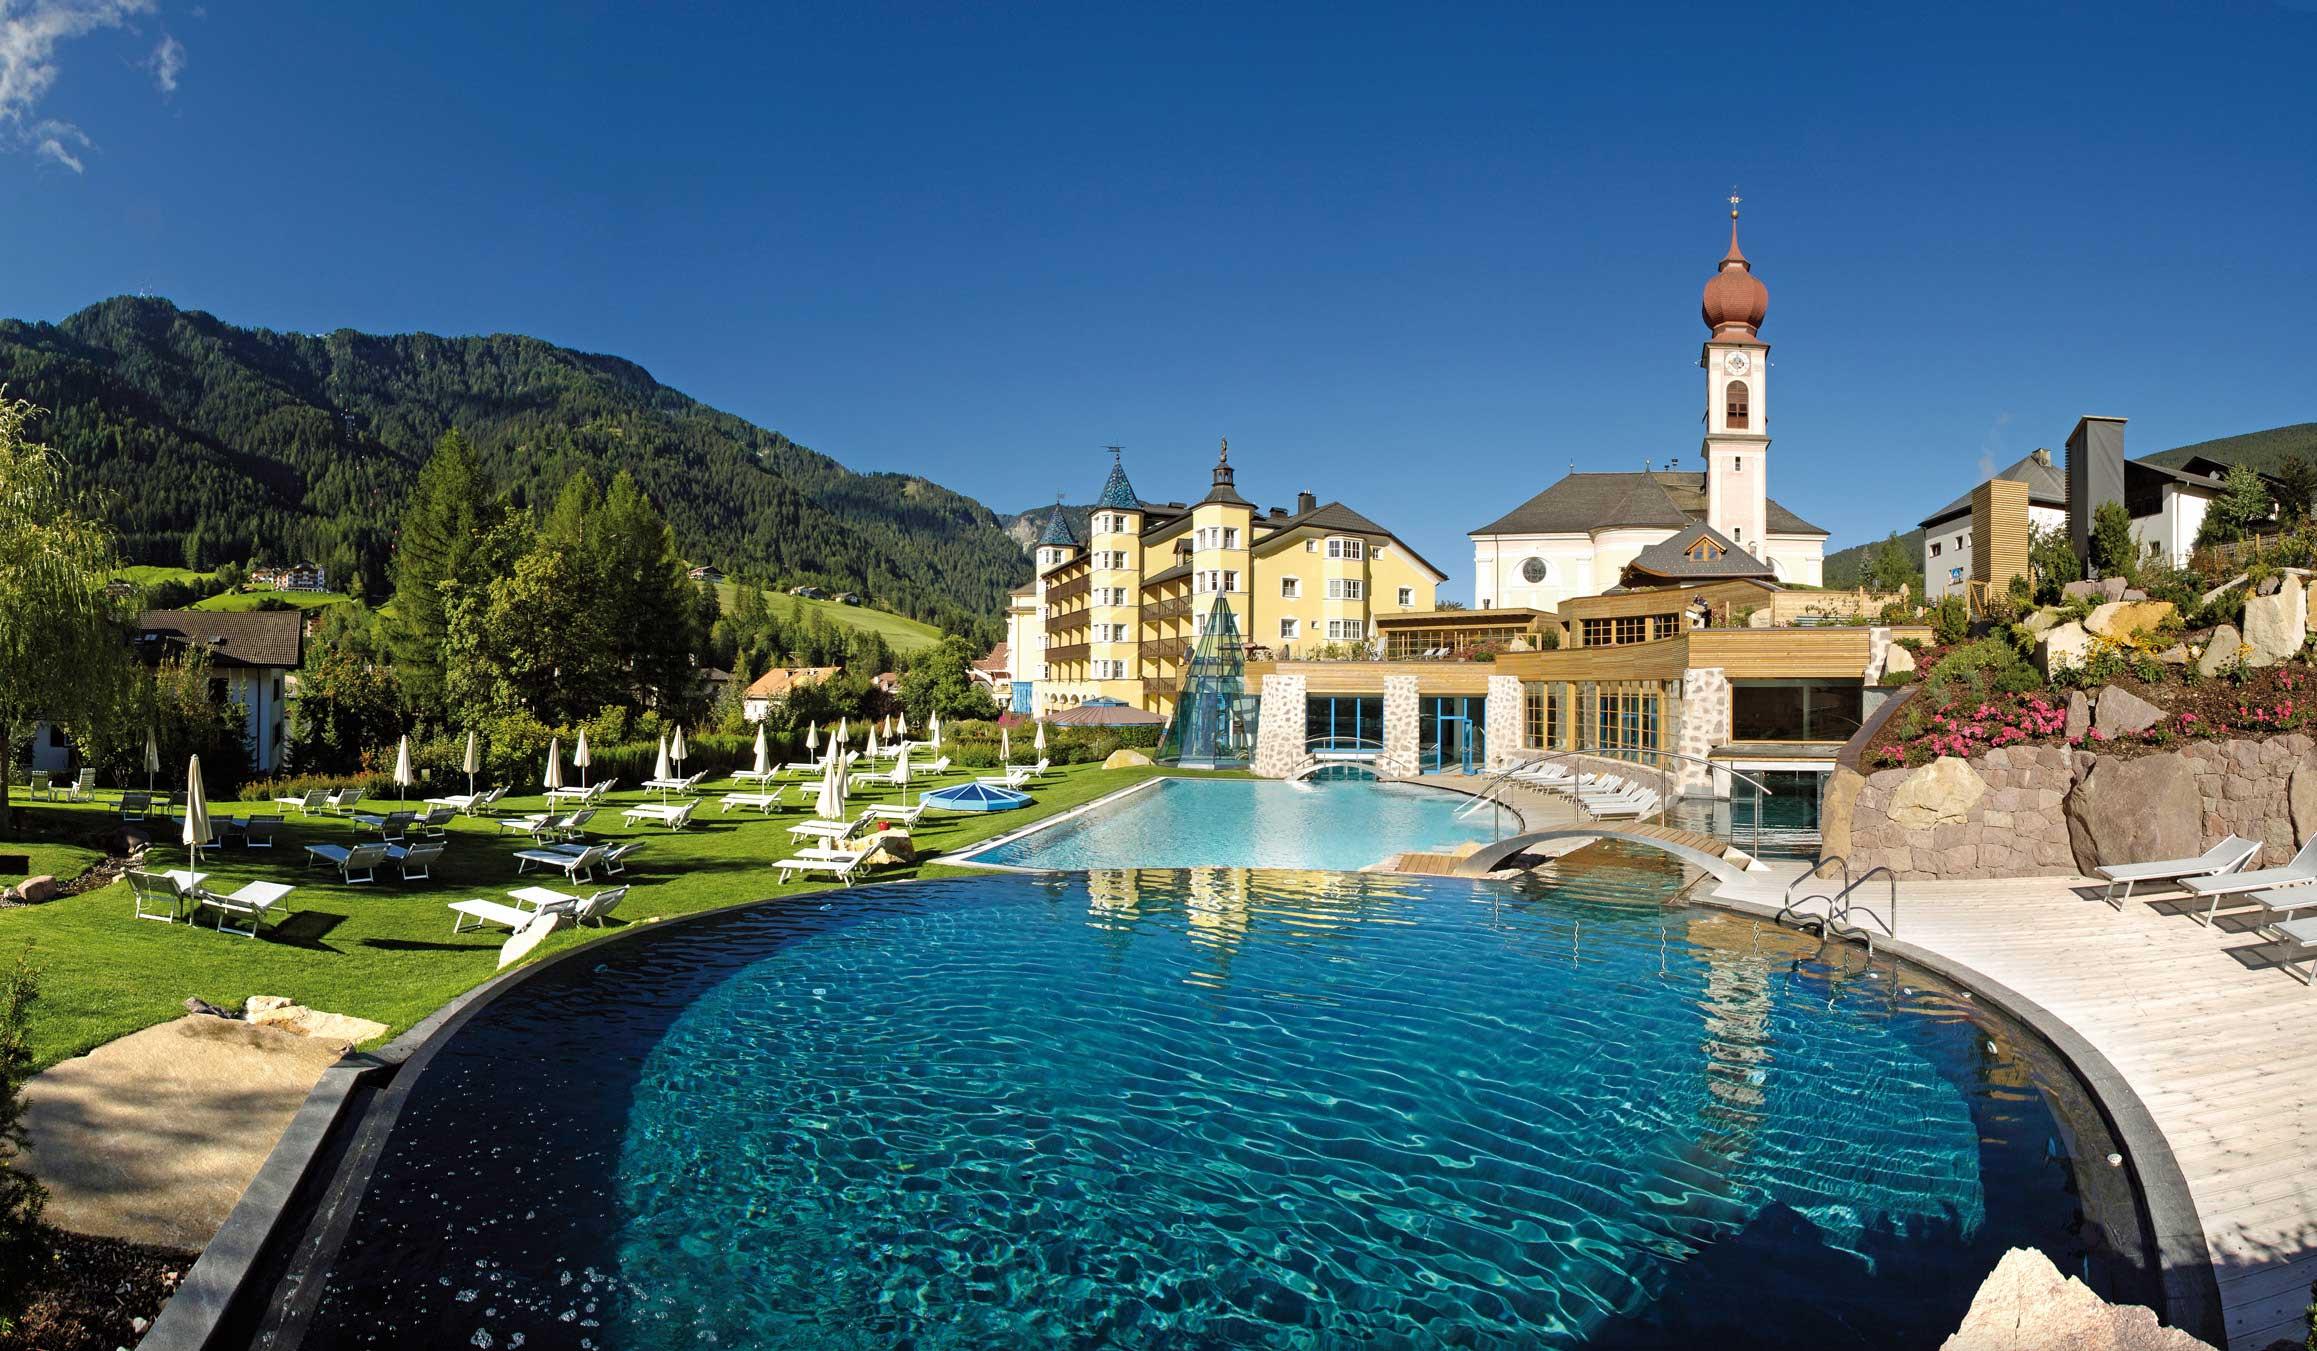 ADLER DOLOMITI Spa & Sport Resort, Sankt Ulrich